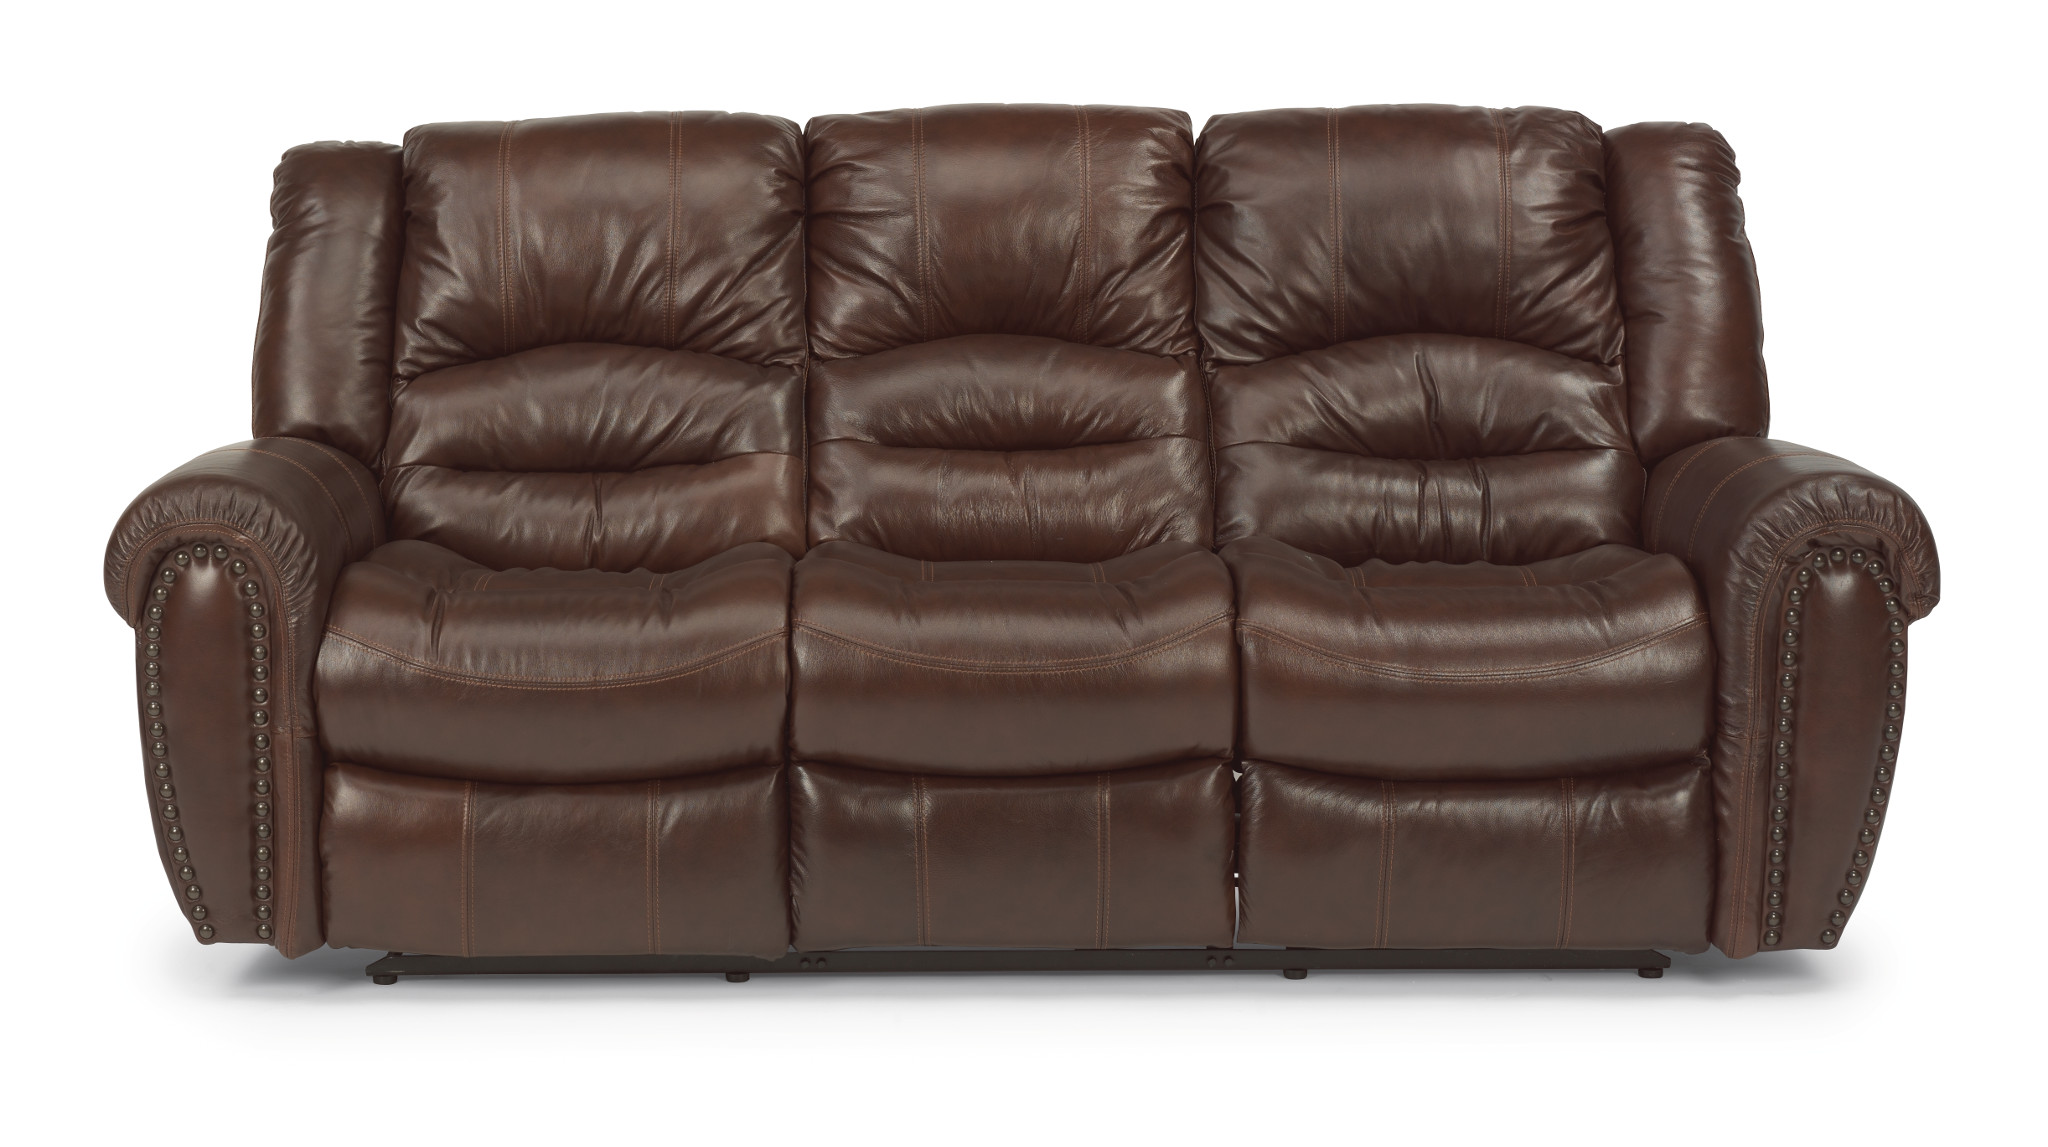 Flexsteel Crosstown Leather Reclining Sofa 1210 62